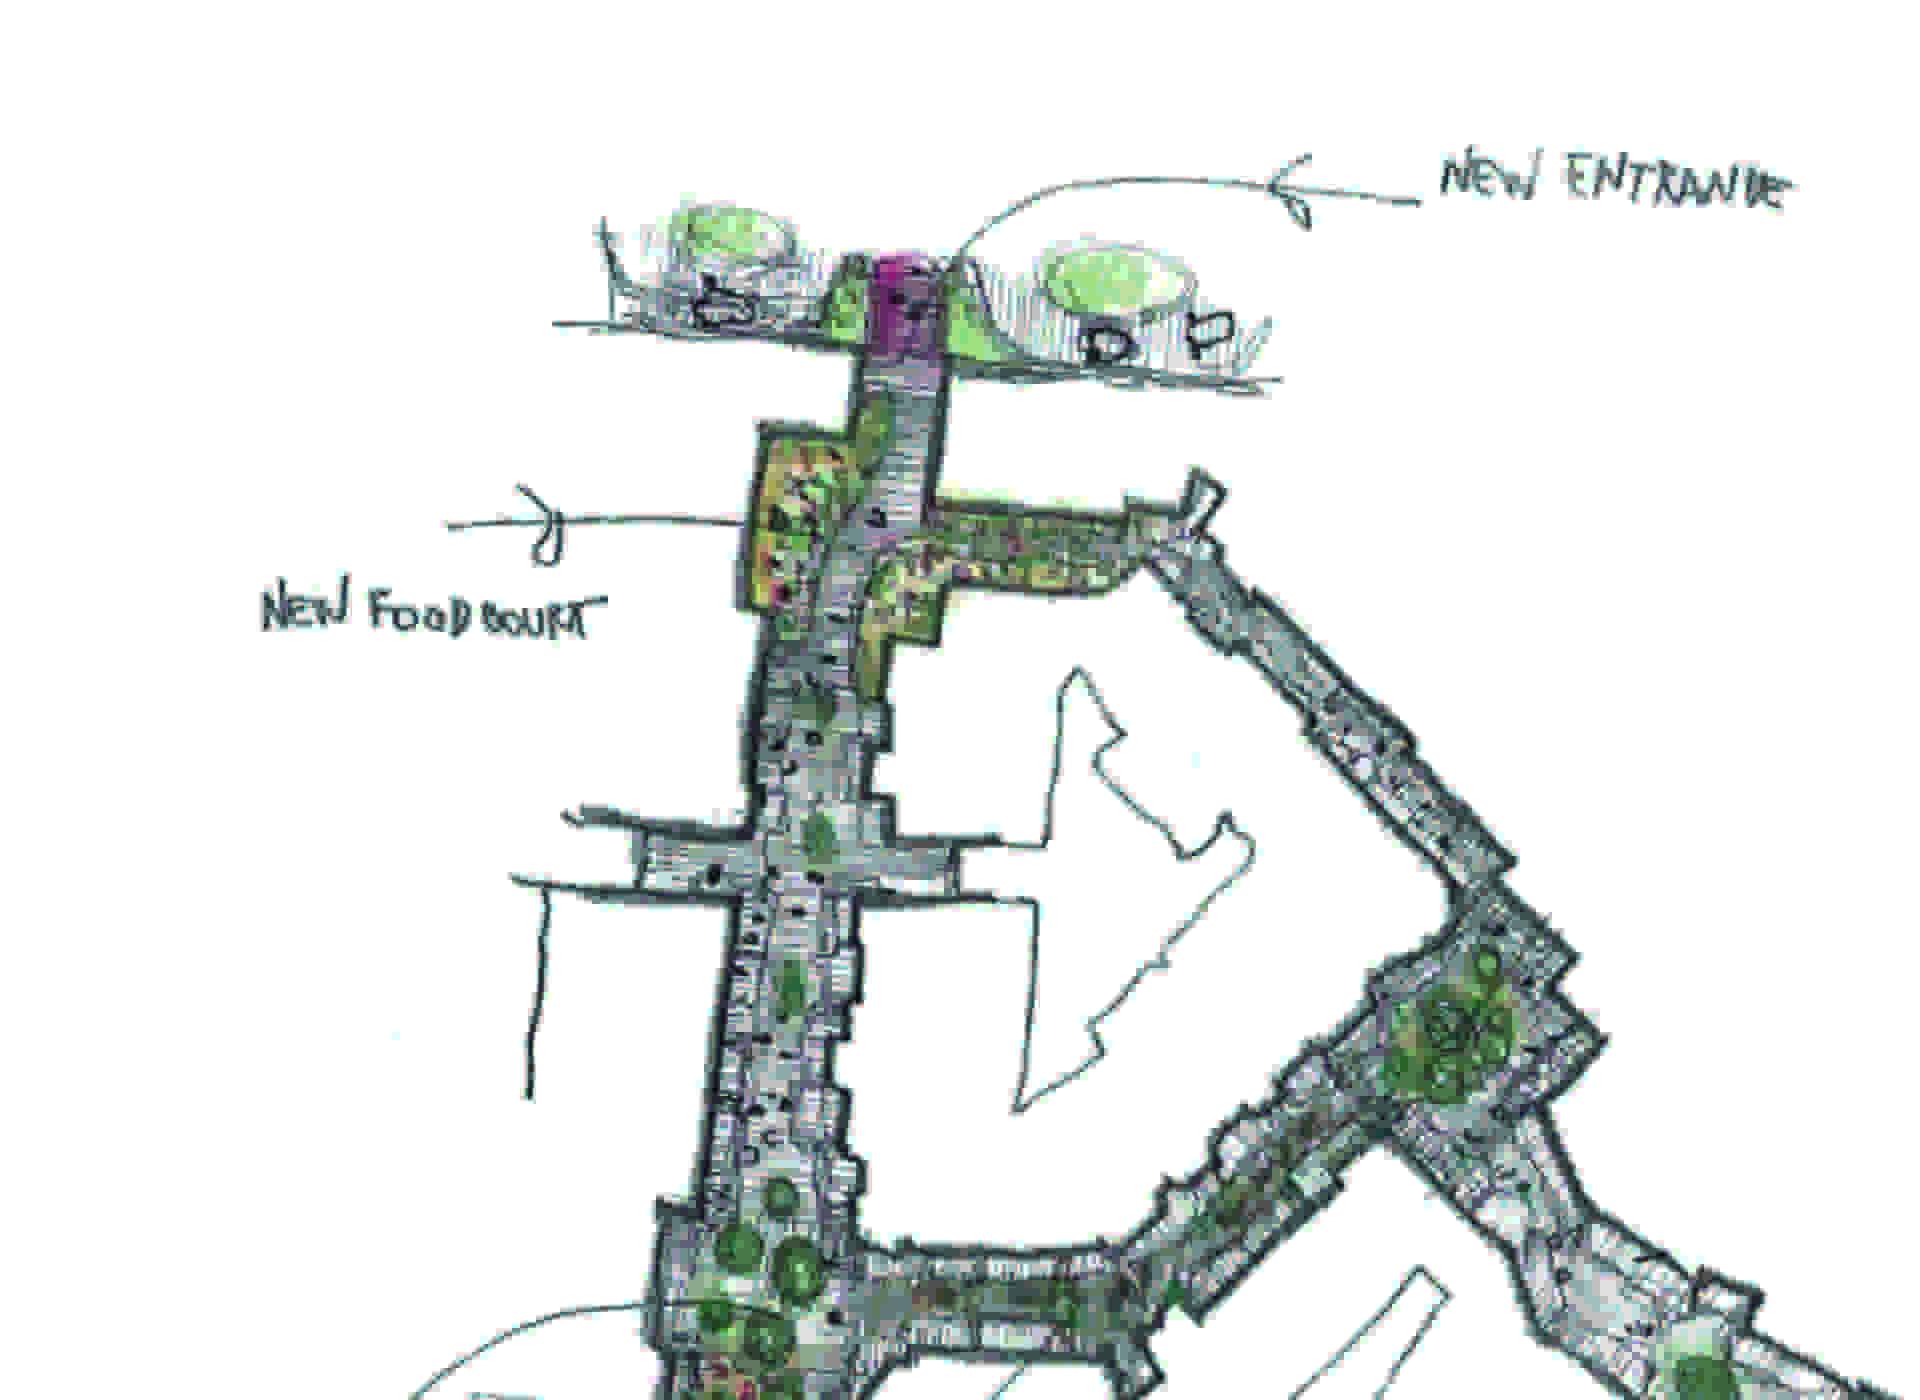 Lombardini22: Neuer Eingang und Food Court beim Valmontone Outlet